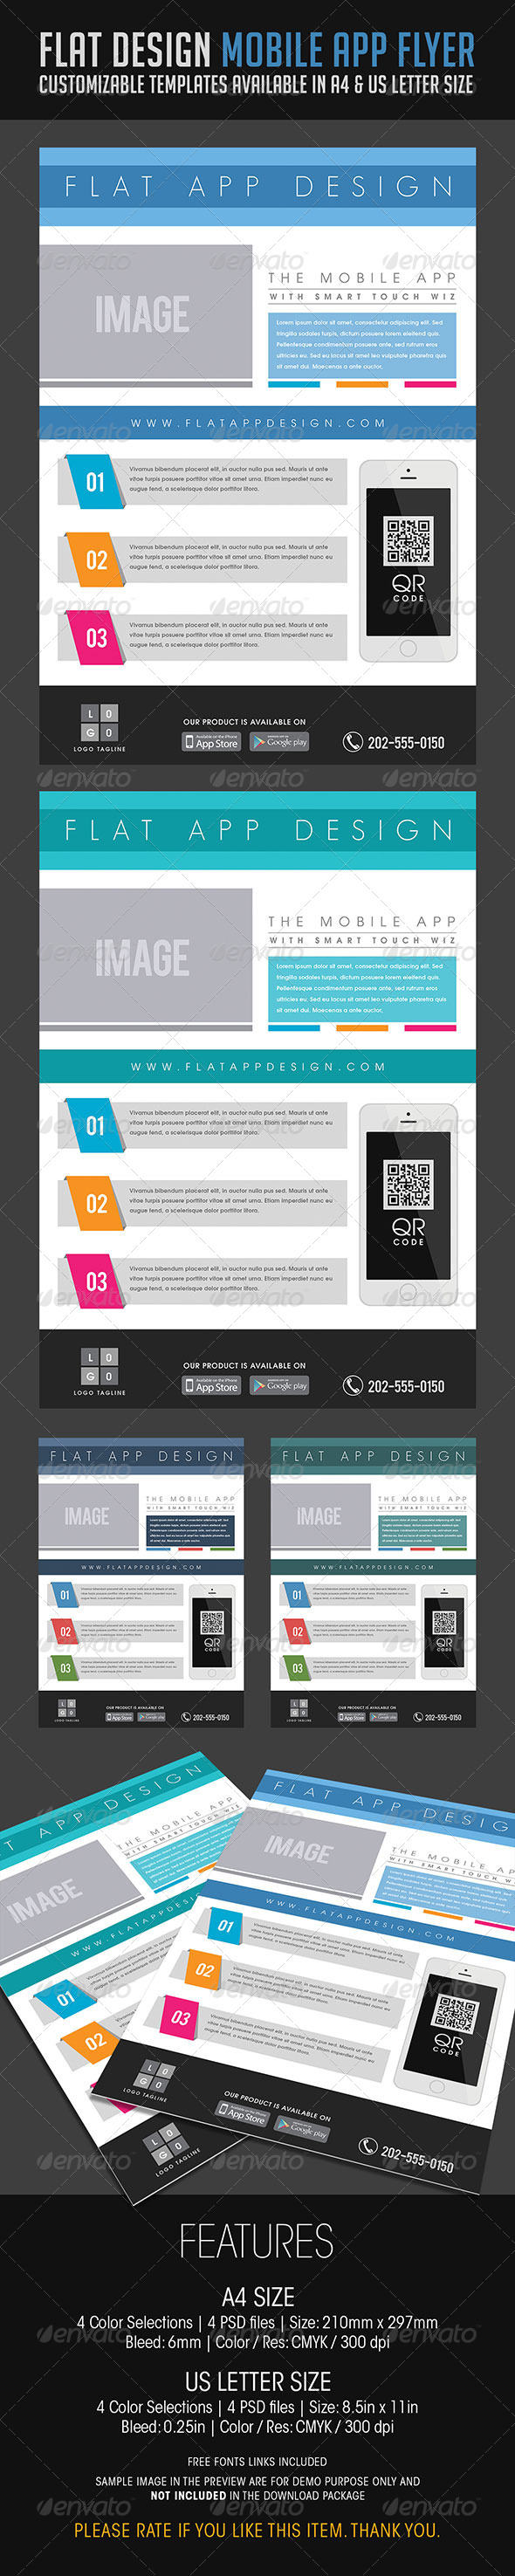 Flat Design Mobile App Flyer - Flyers Print Templates